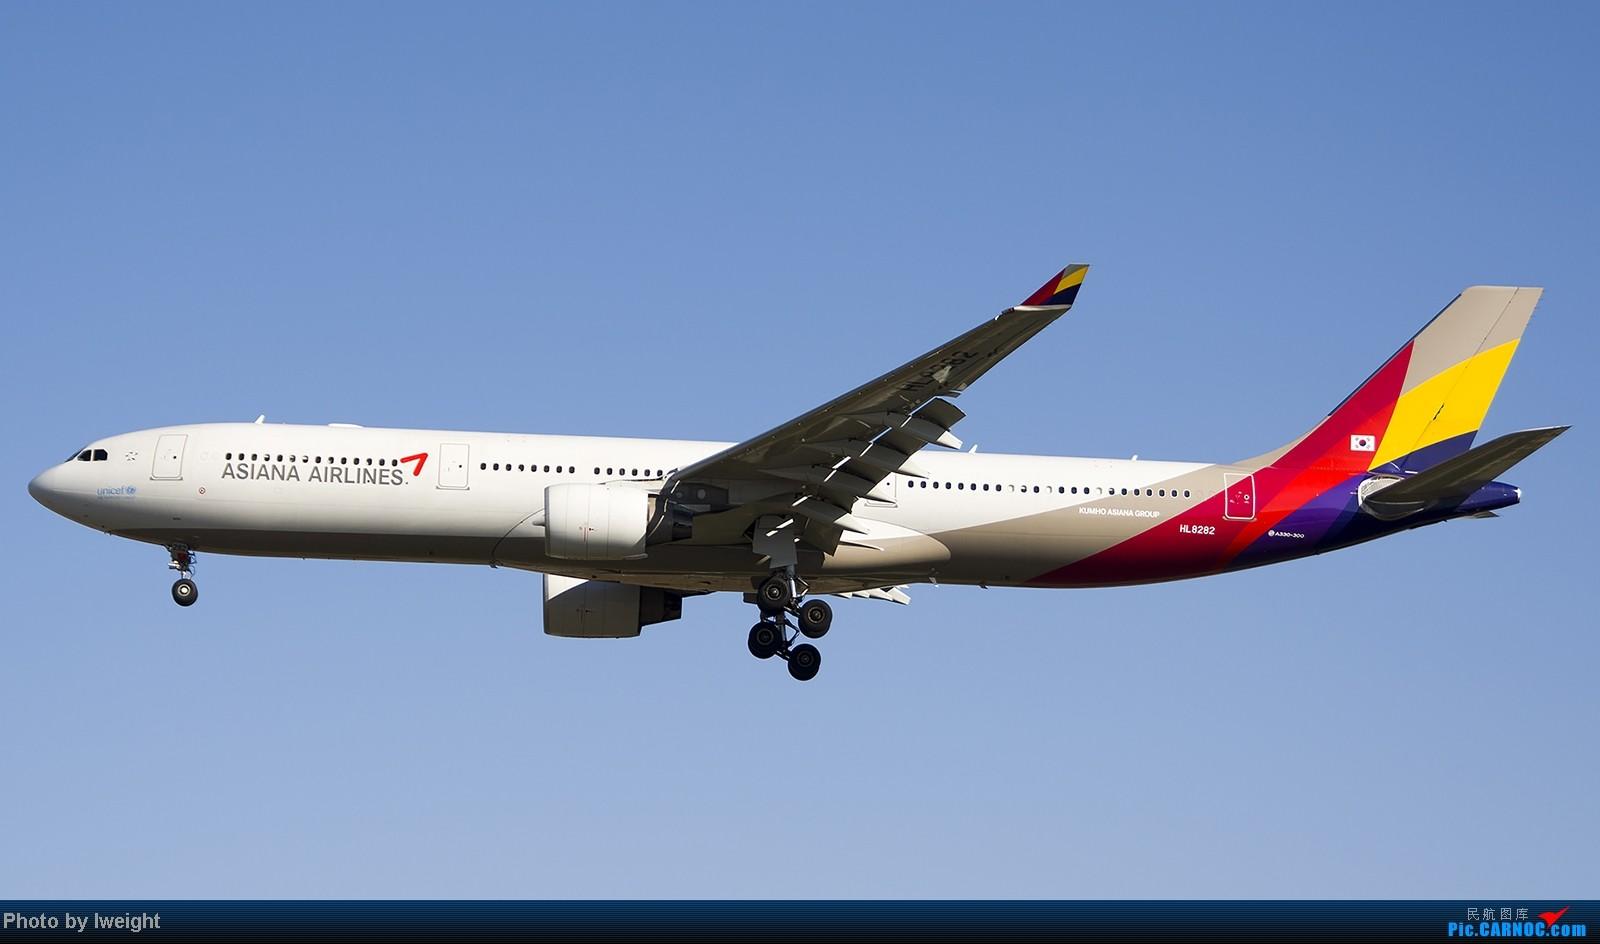 Re:[原创]终于盼来了晴天,PEK拍起【10月26日】 AIRBUS A330-300 HL8212 中国北京首都机场